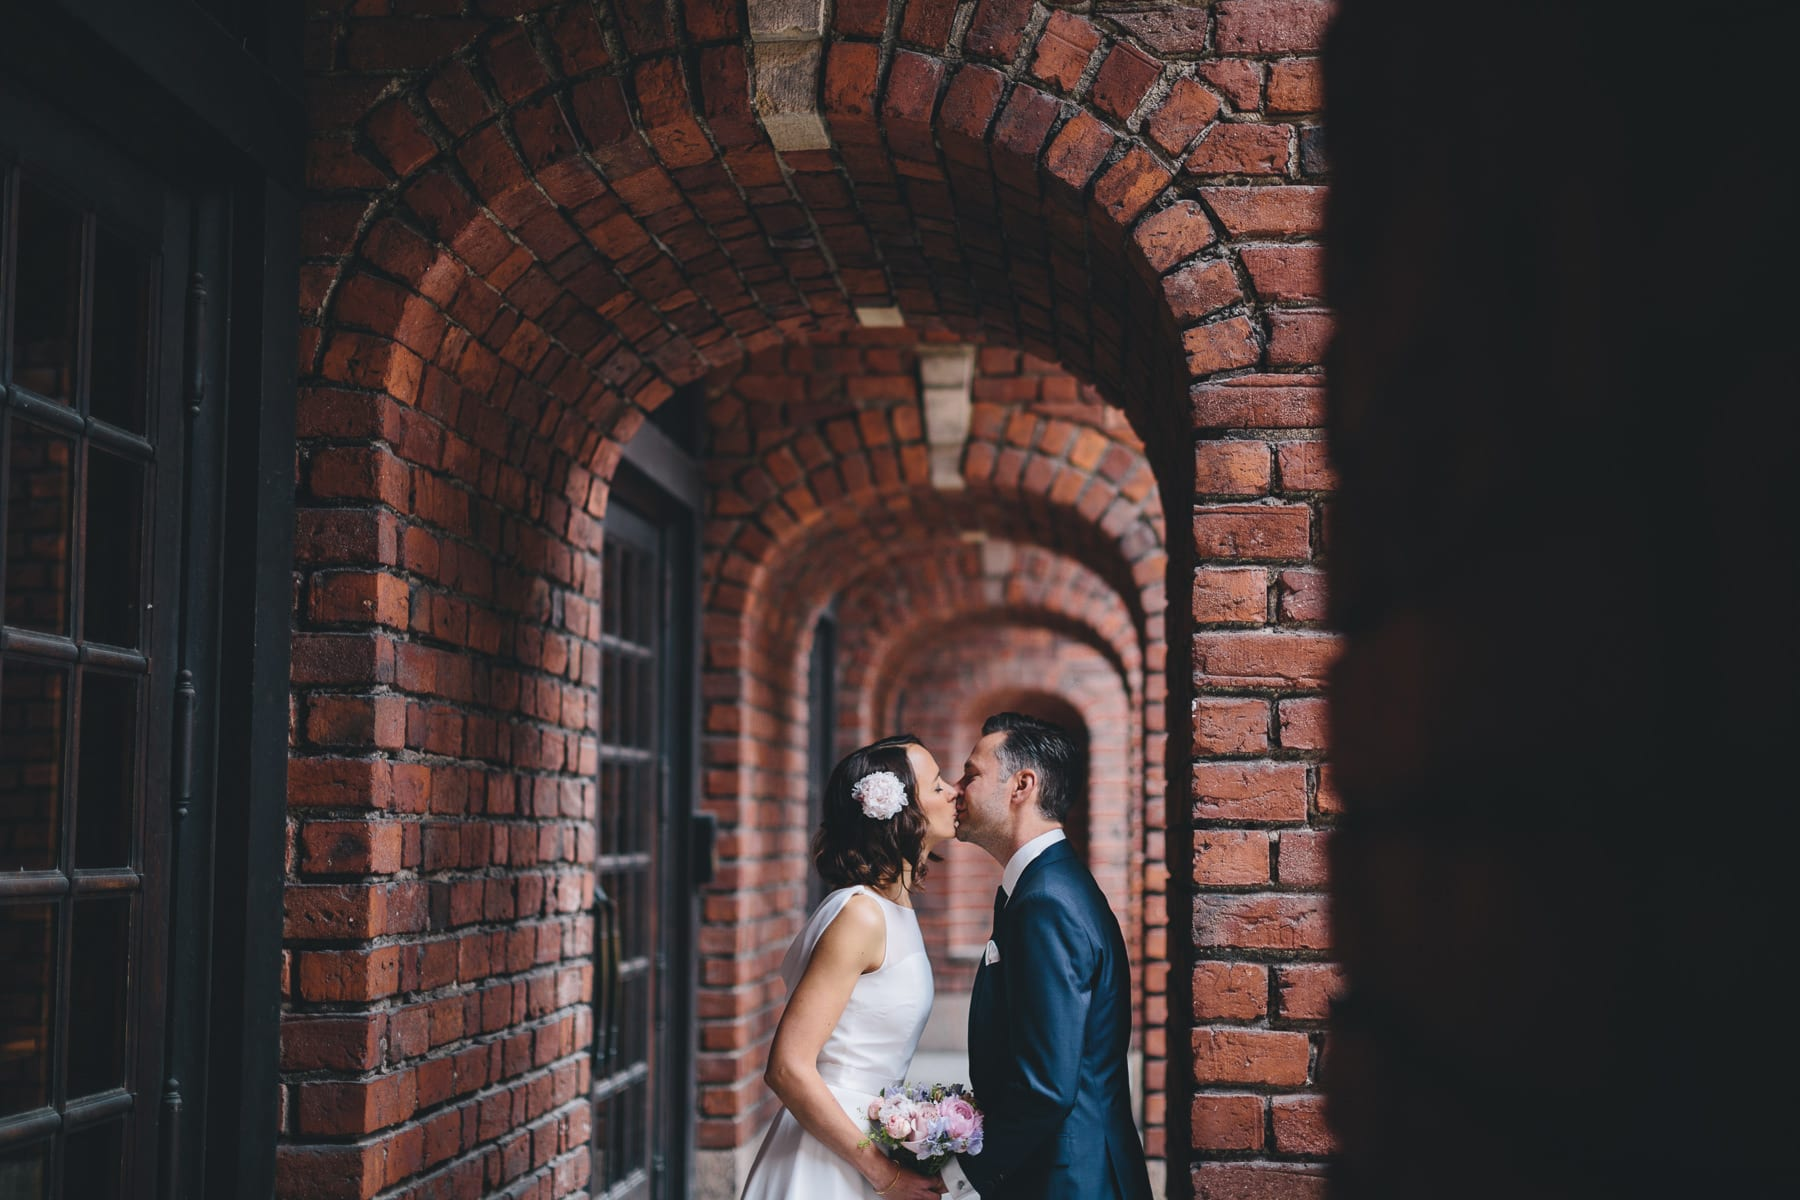 Stockholms Stadshus vigsel bröllopsfotograf